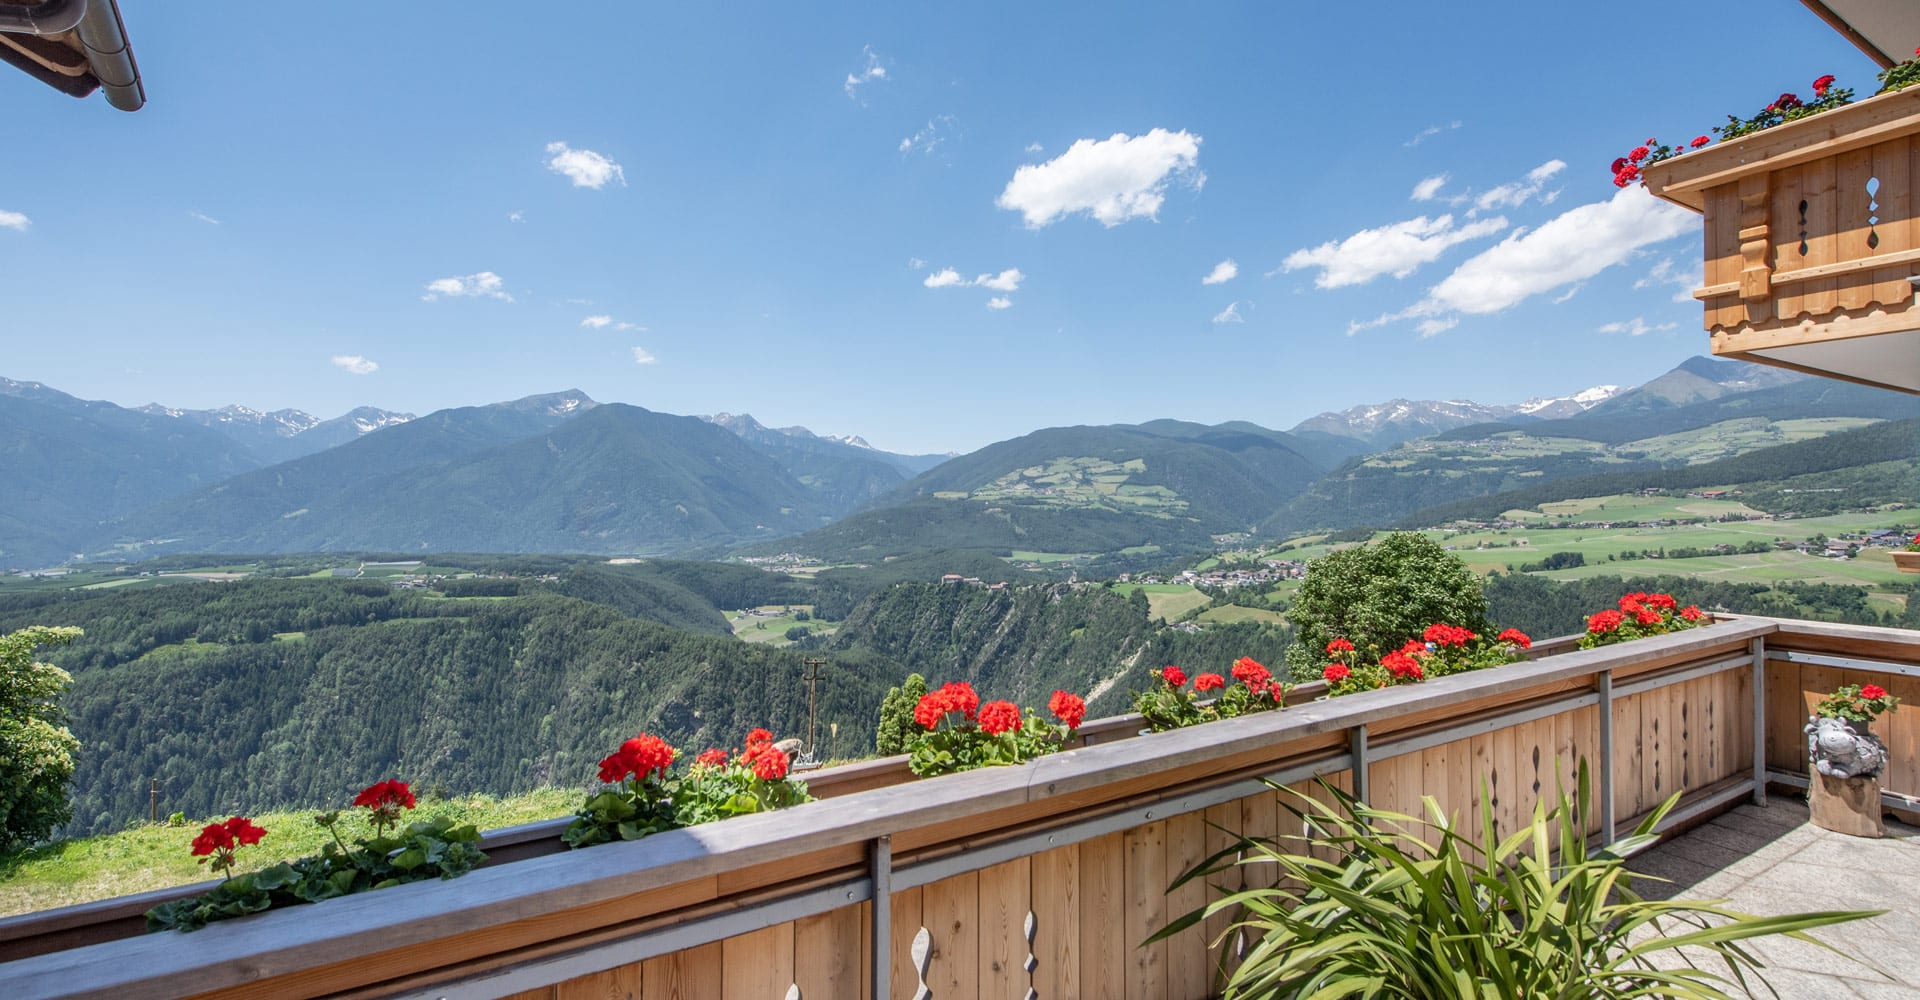 forchnerhof-panorama-rodeneck